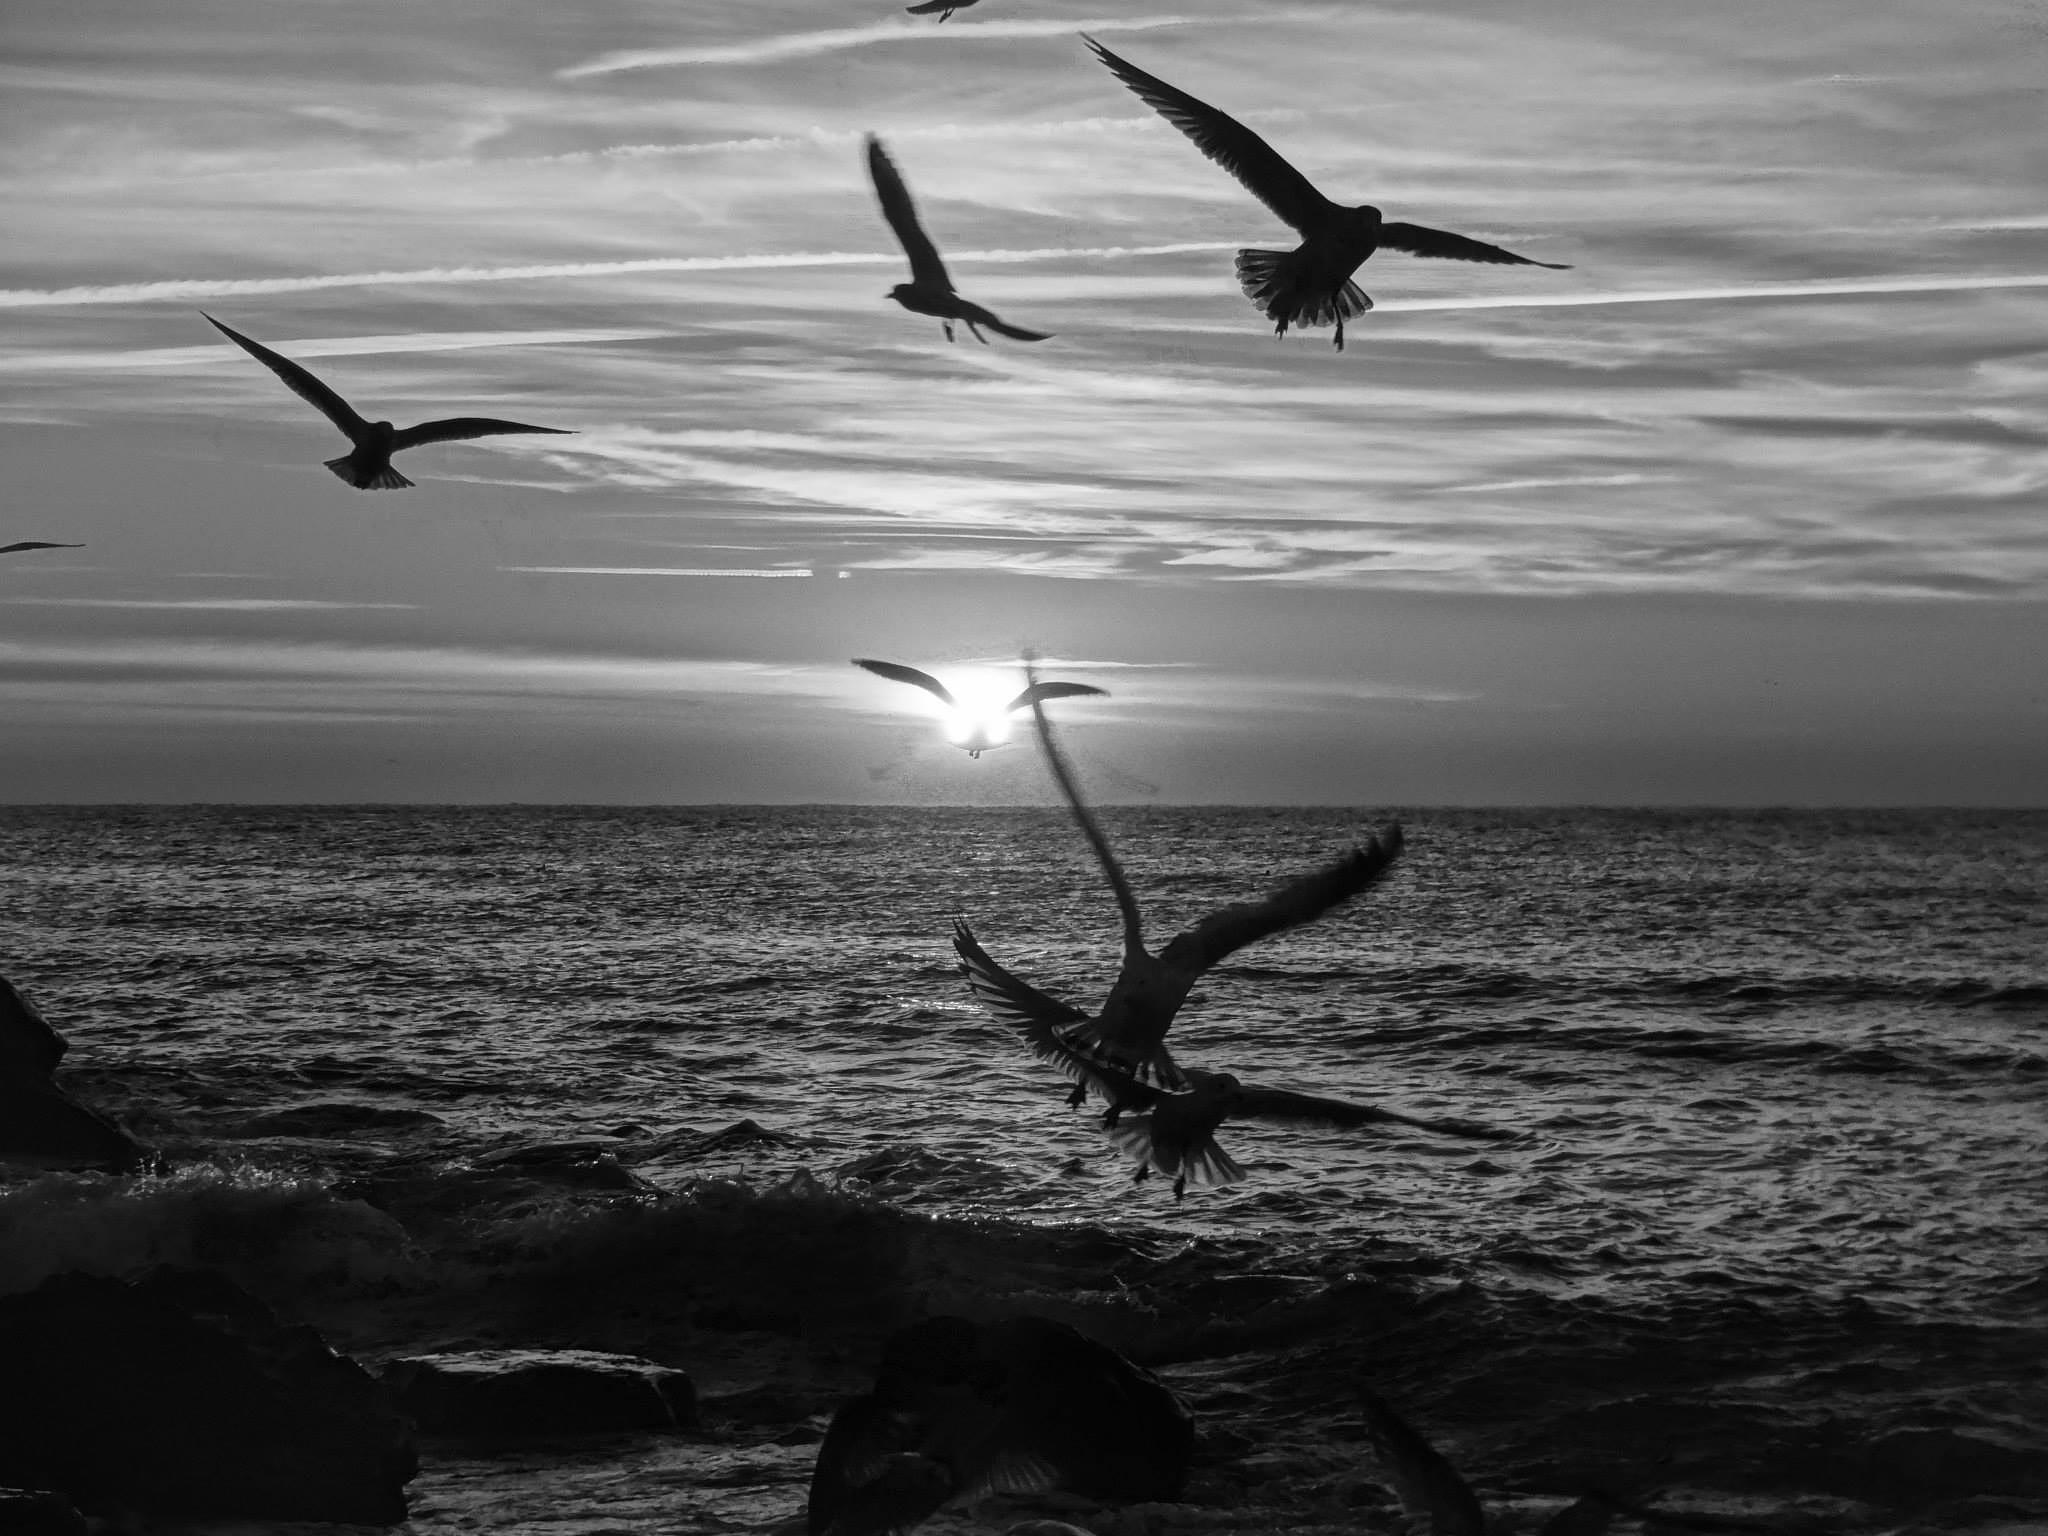 Untitled by david.strollo.5